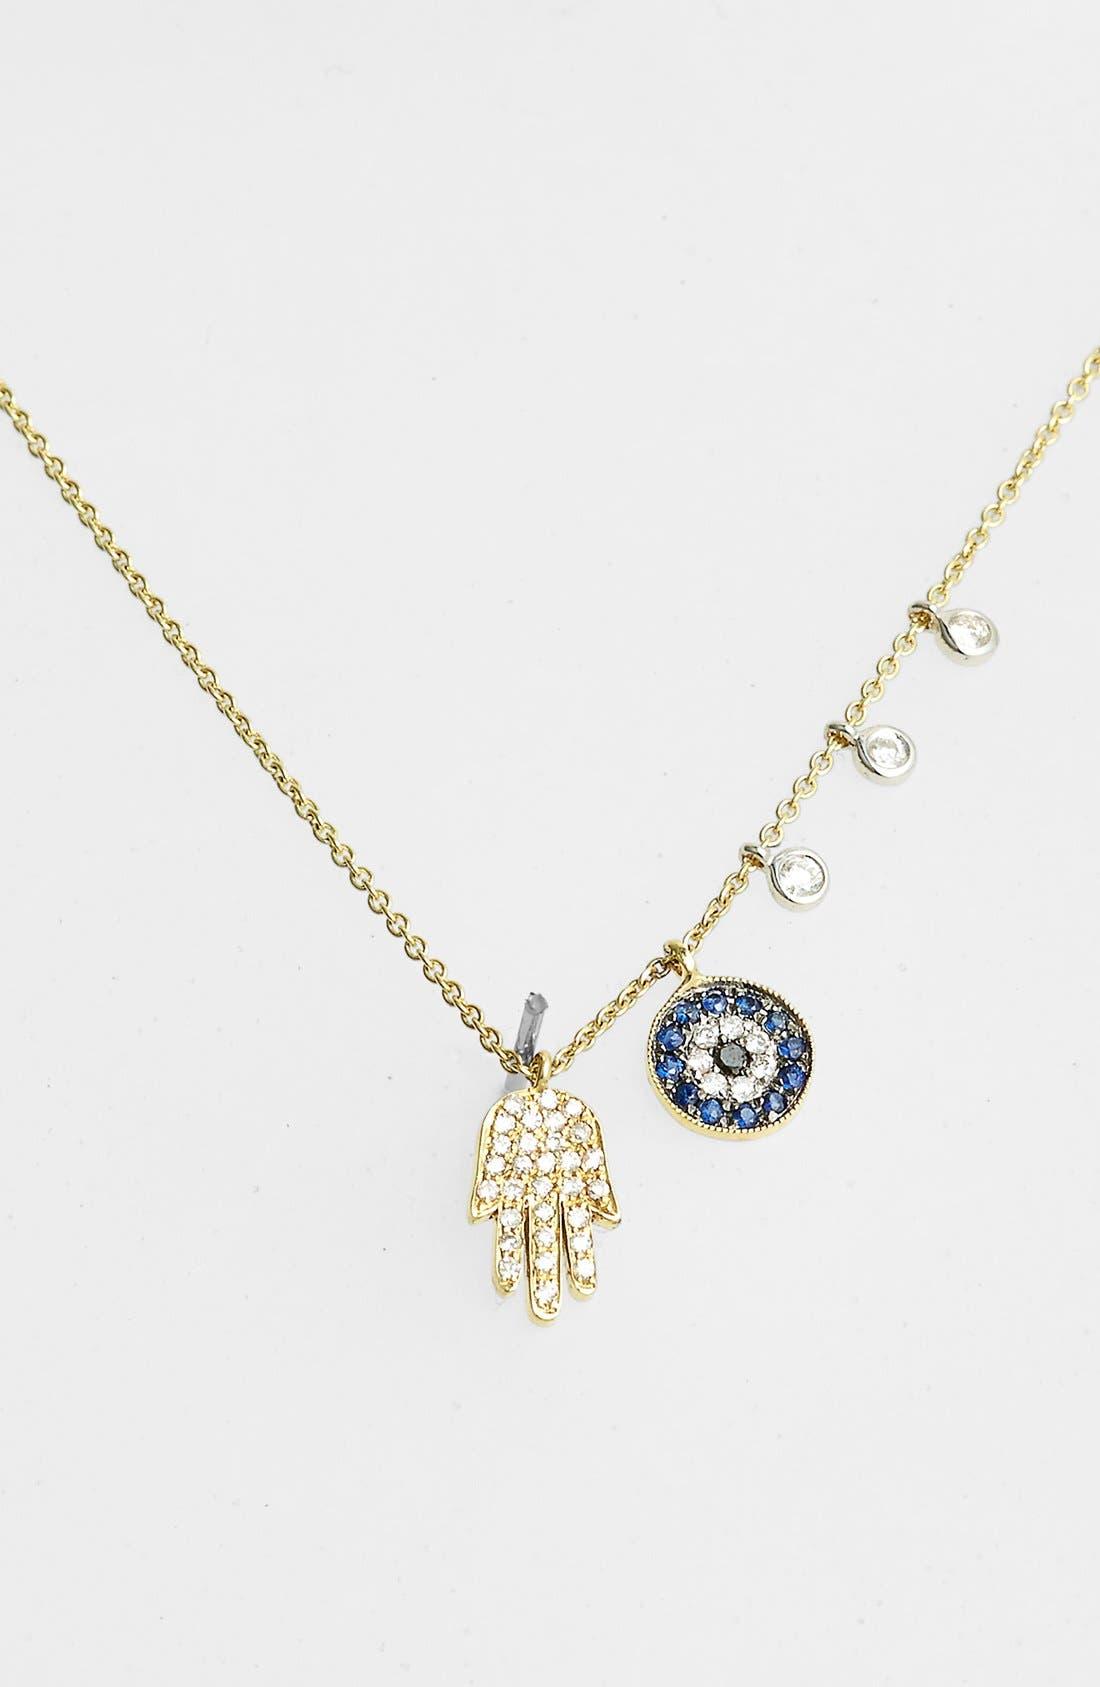 MEIRA T MeiraT 'Desert Infusion' Diamond & Sapphire